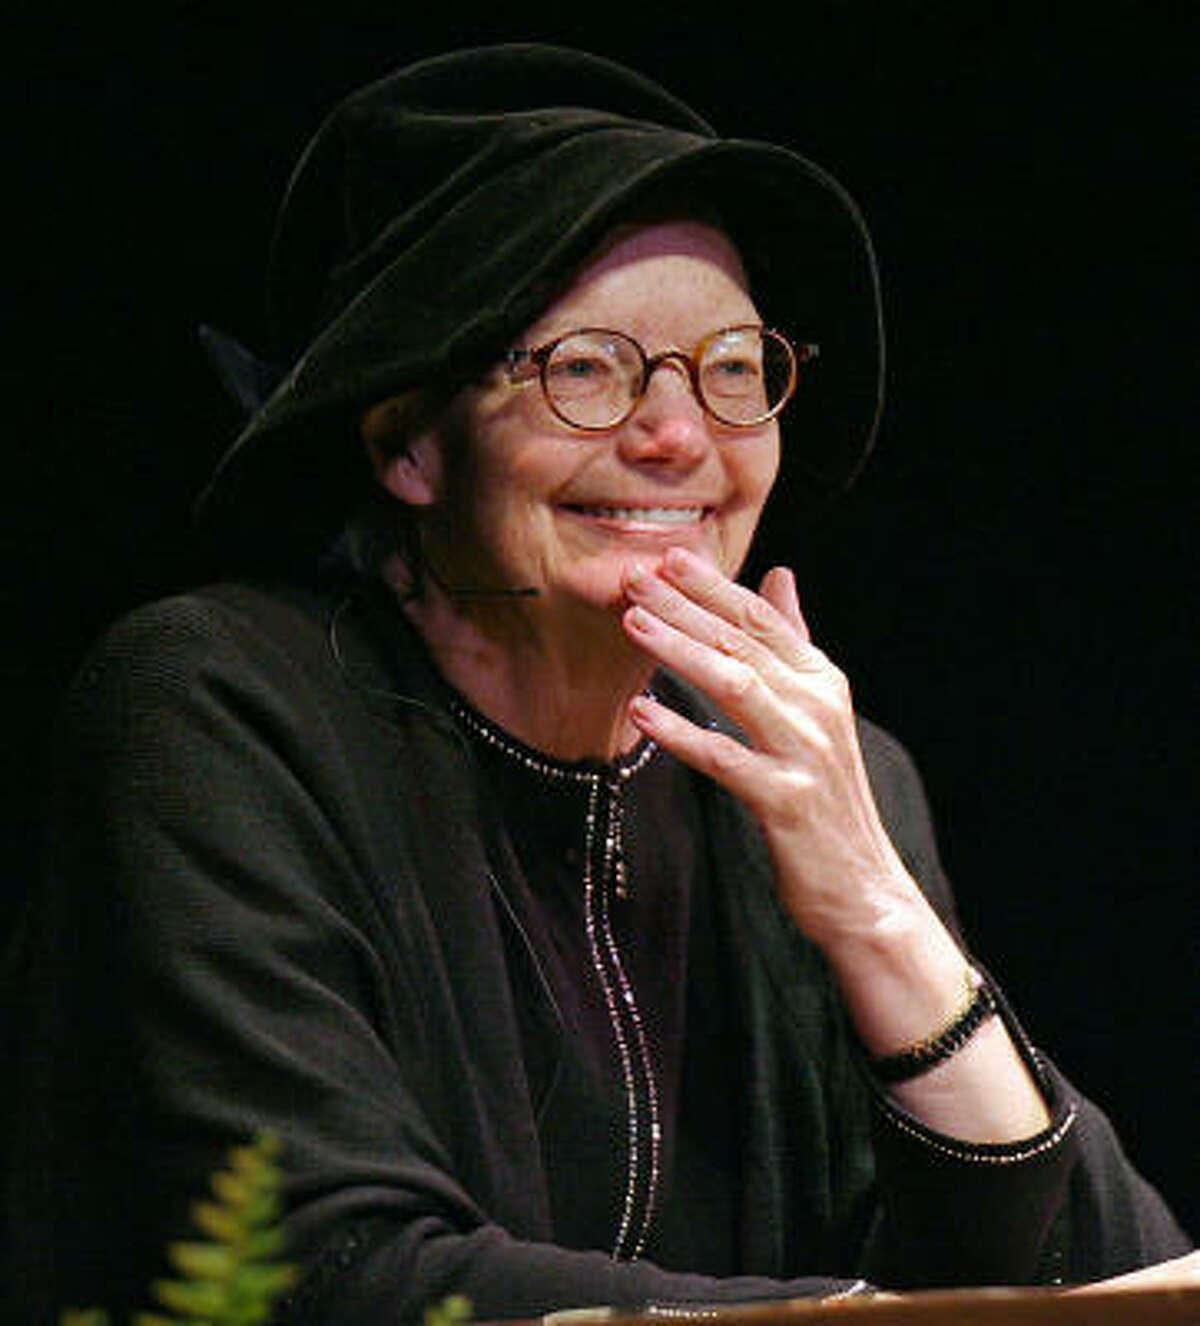 Molly Ivins speaks at the University of Texas in Austin, Nov. 15, 2006.